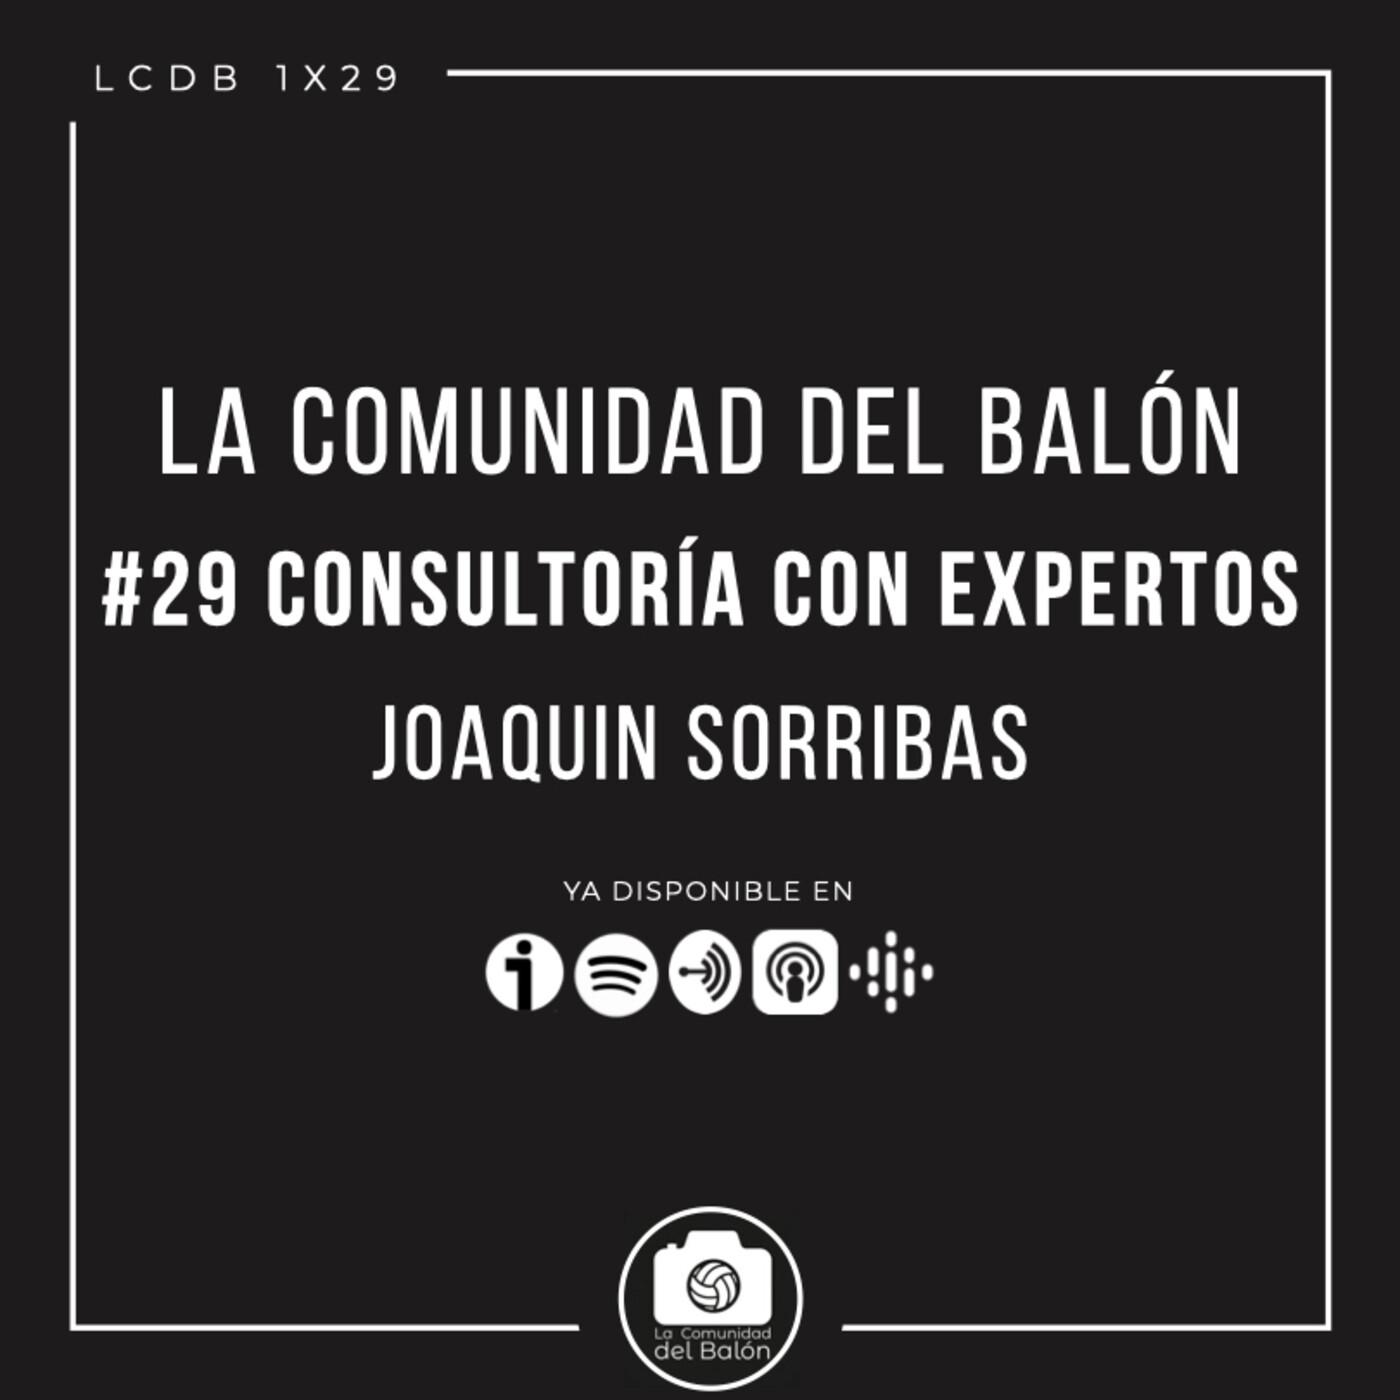 #29 Consultoría con expertos: Joaquín Sorribas